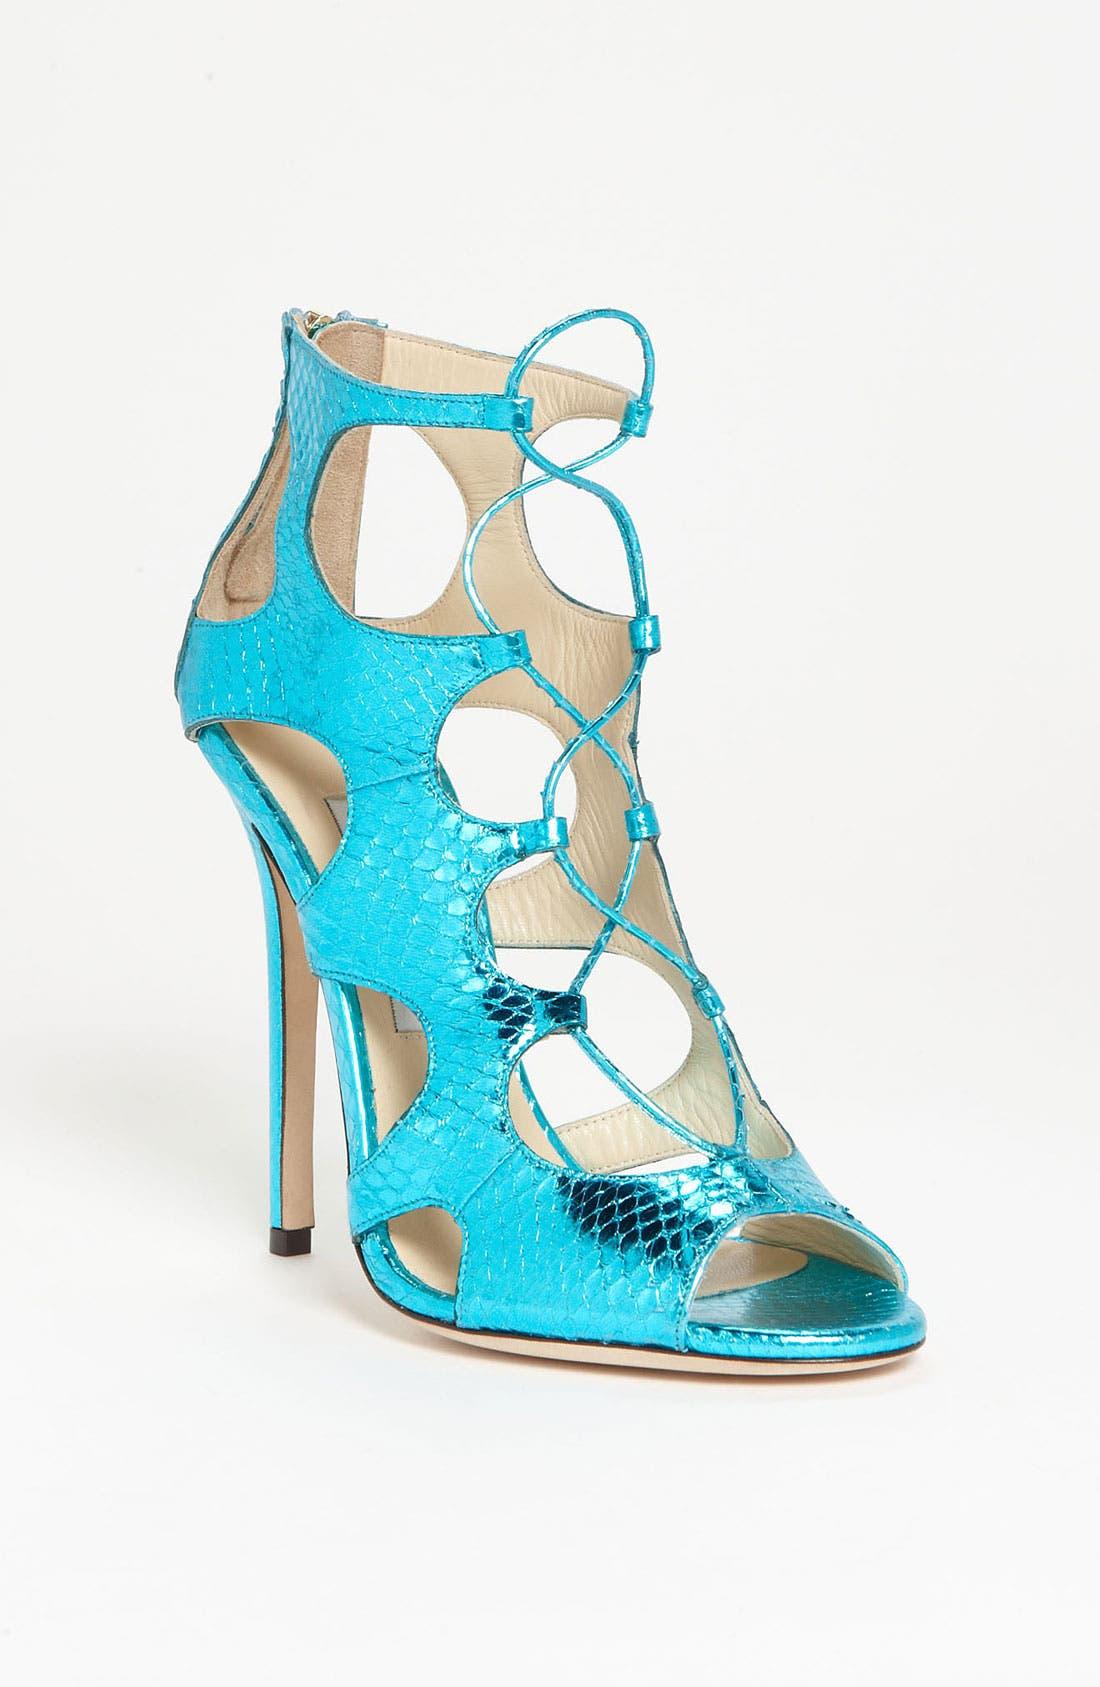 Main Image - Jimmy Choo 'Diffuse' Sandal